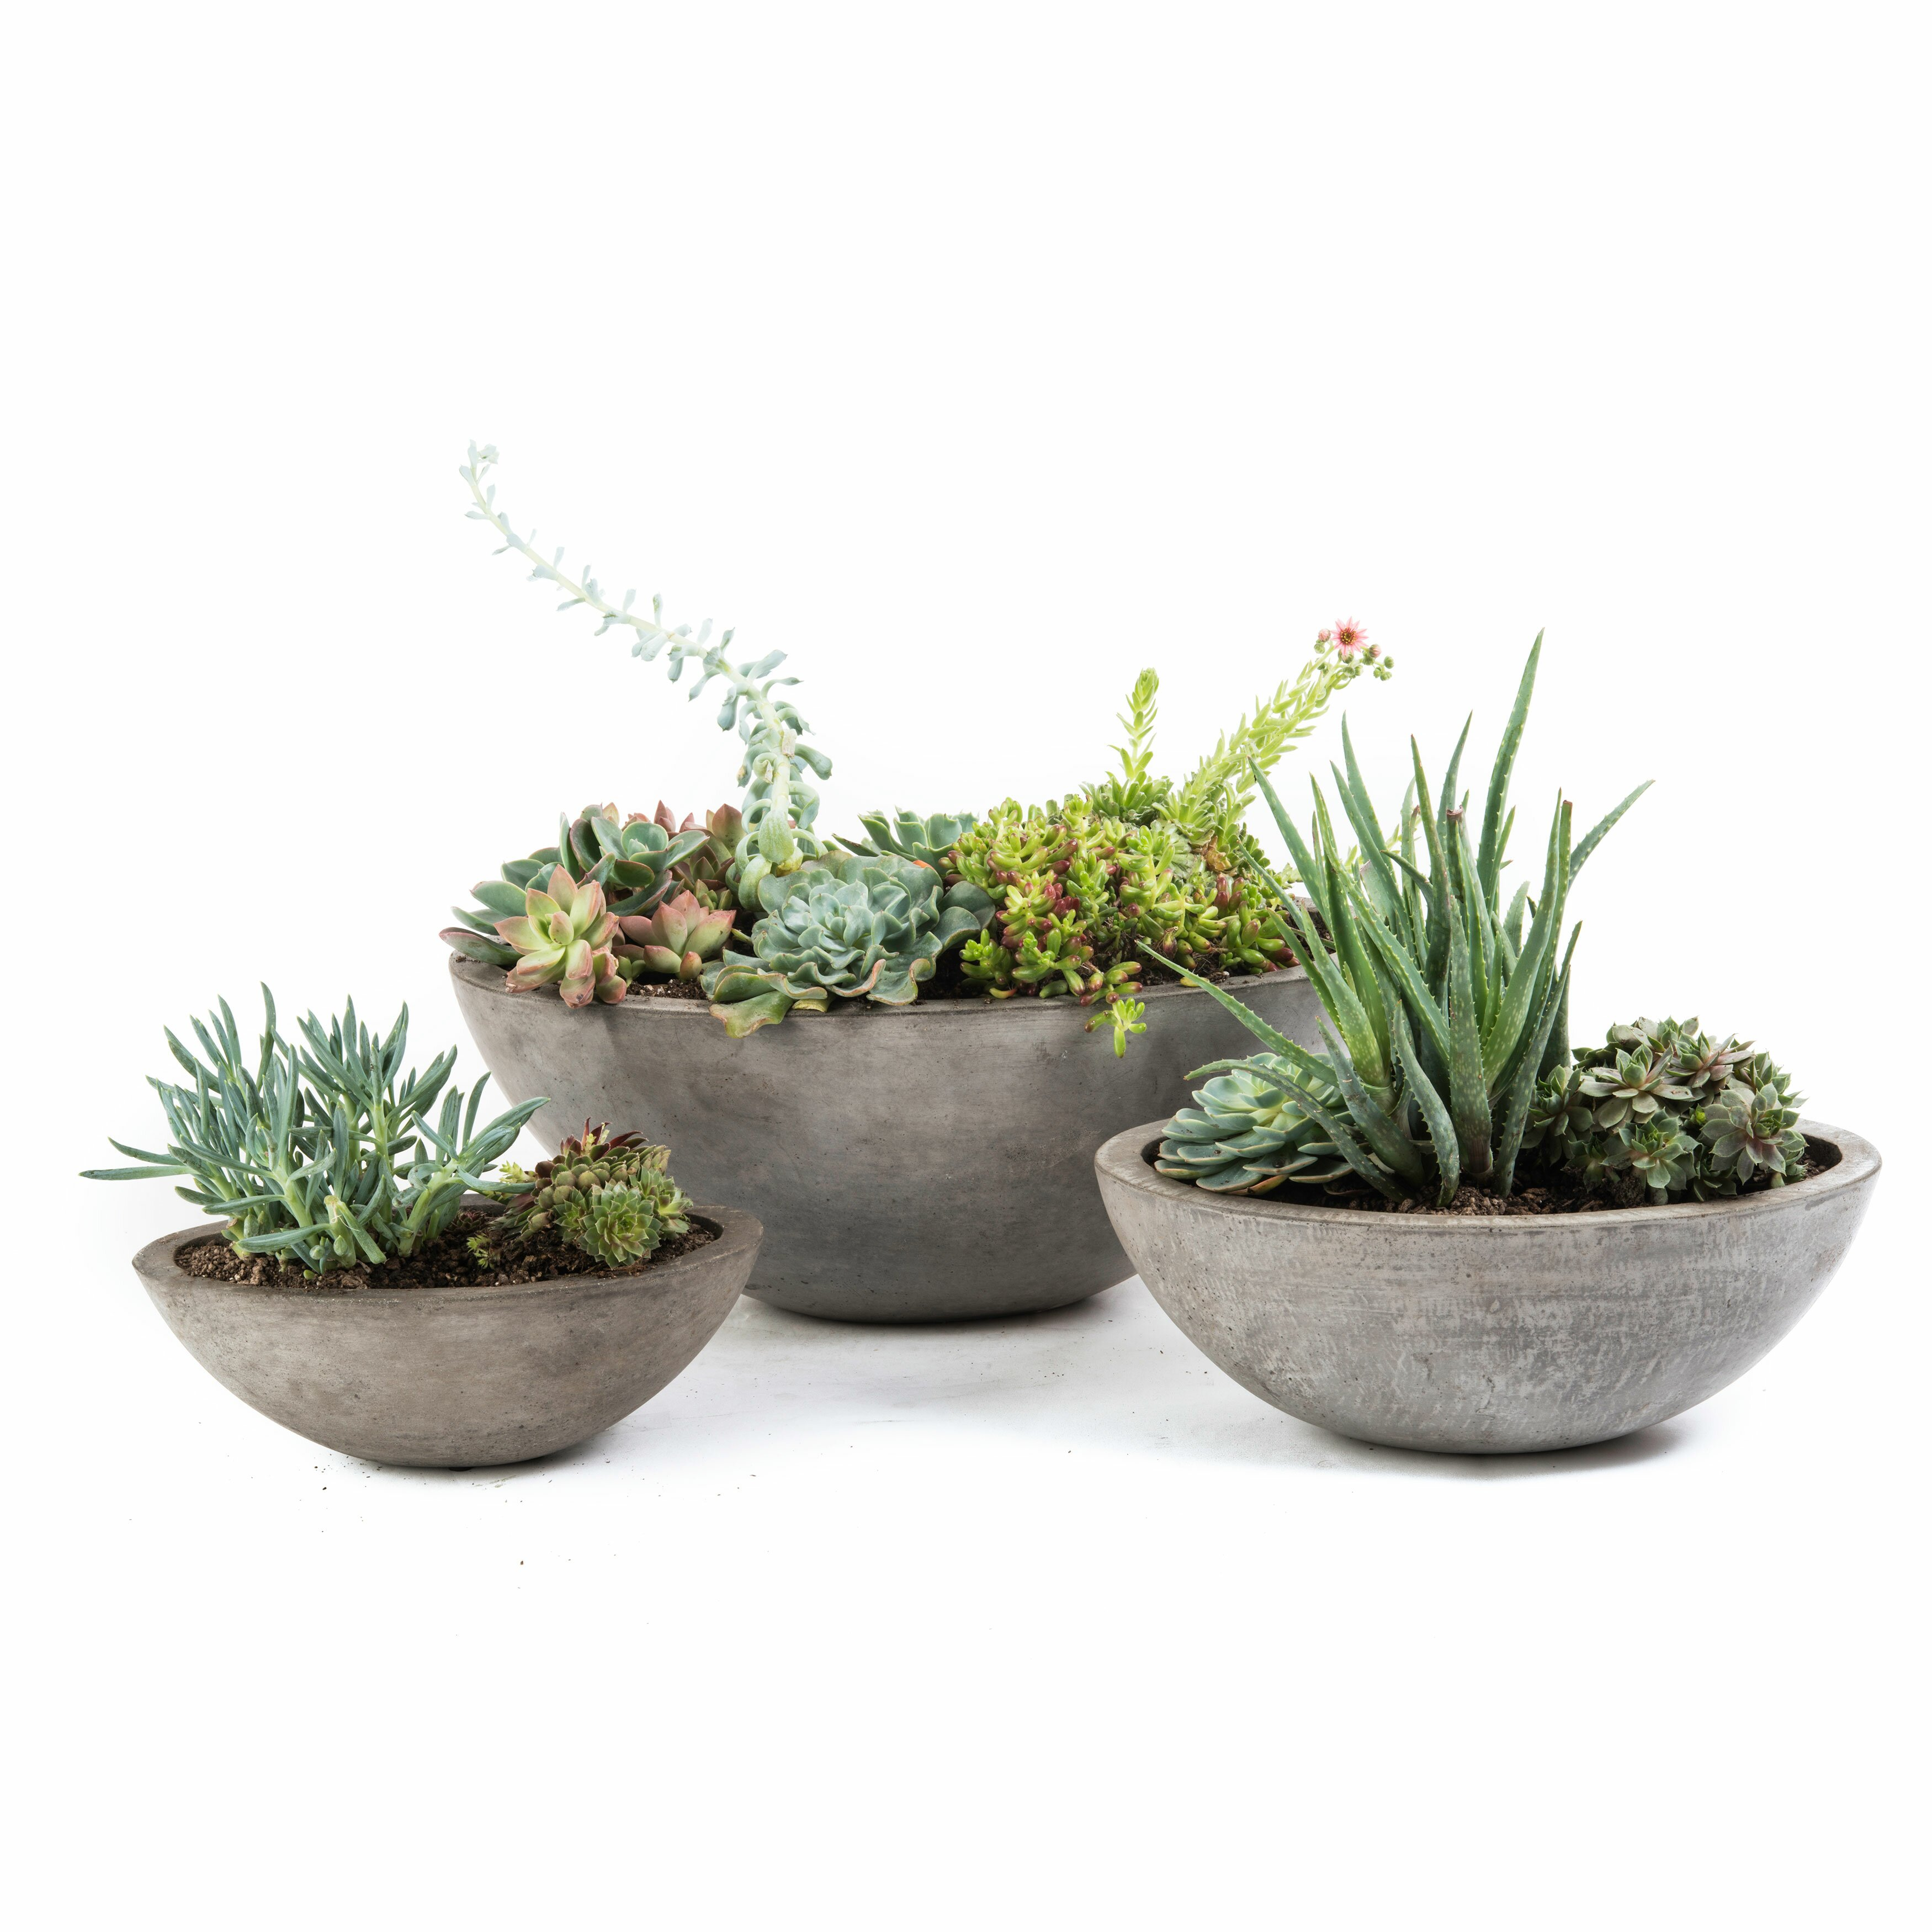 My Spirit Garden Yano 3 Piece Oval Pot Planter Set